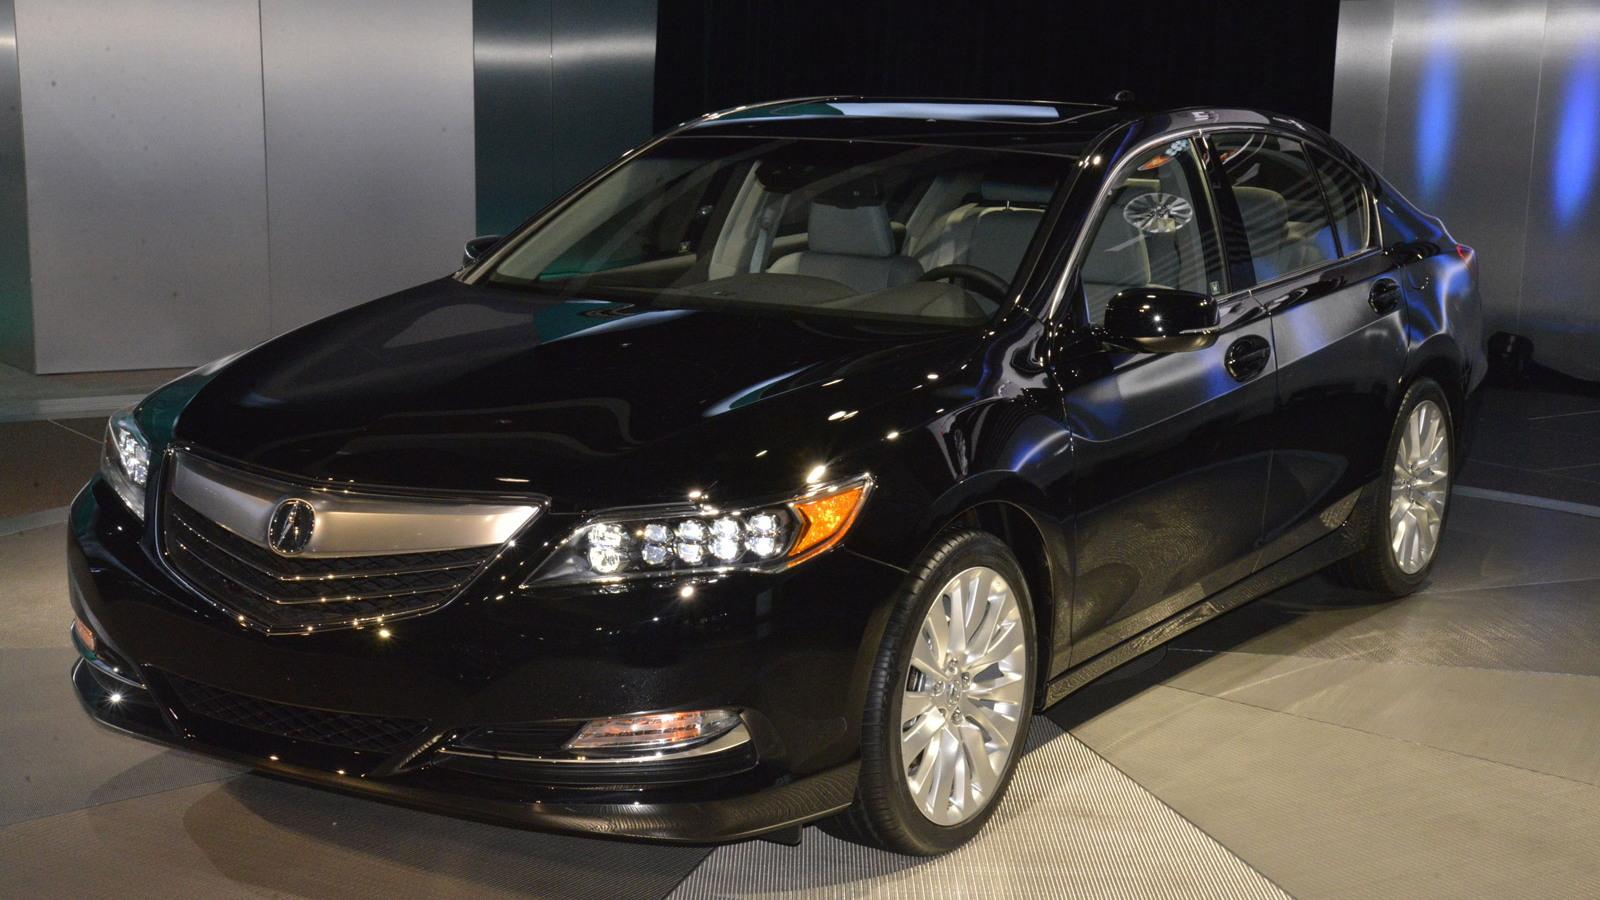 2014 Acura RLX, 2012 Los Angeles Auto Show